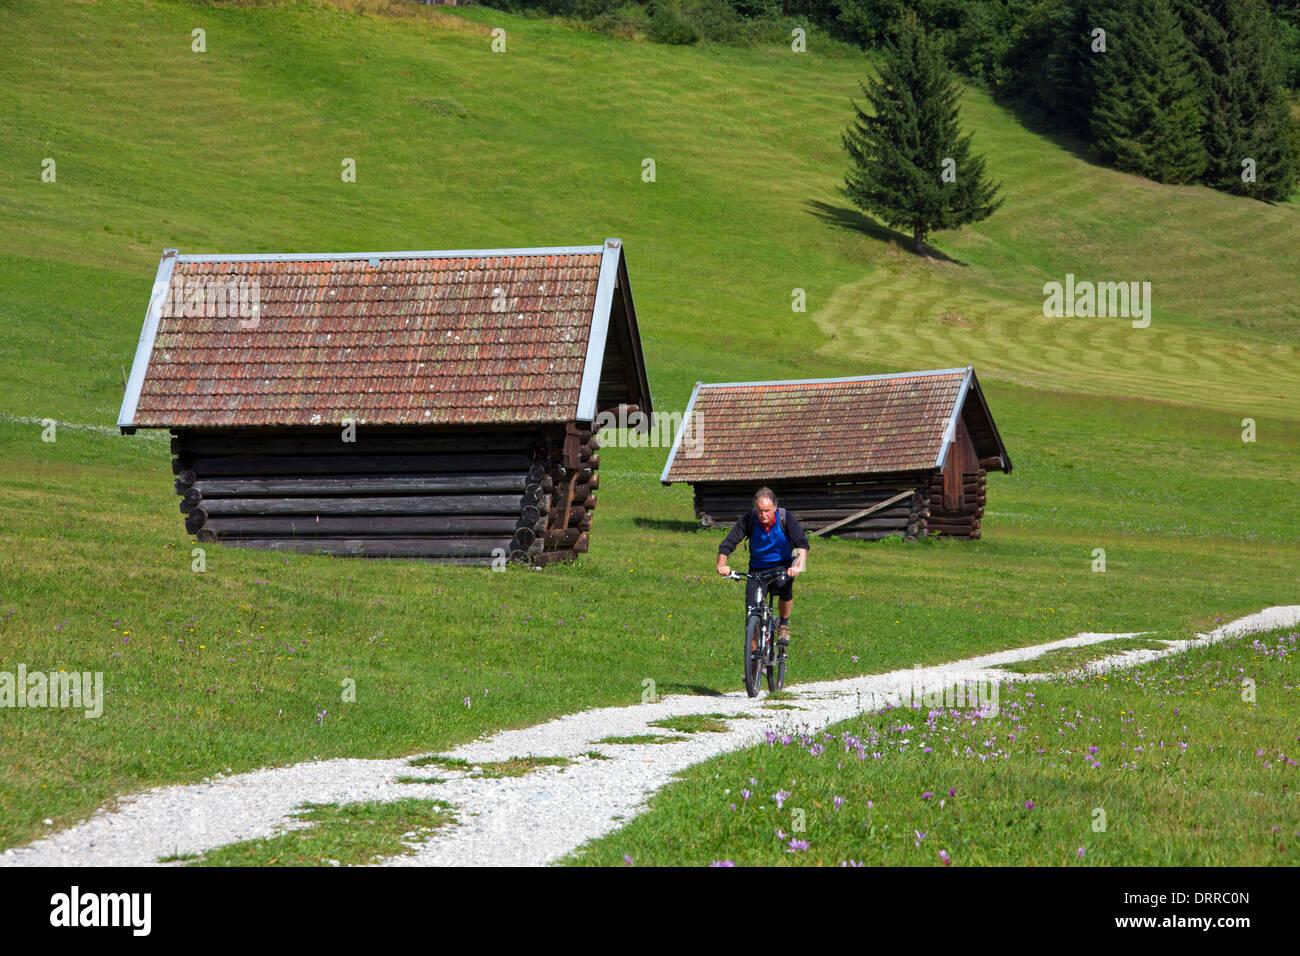 Elderly cyclist / mountain biker cycling past wooden huts / granaries along lake Gerold / Geroldsee near Mittenwald, Germany - Stock Image